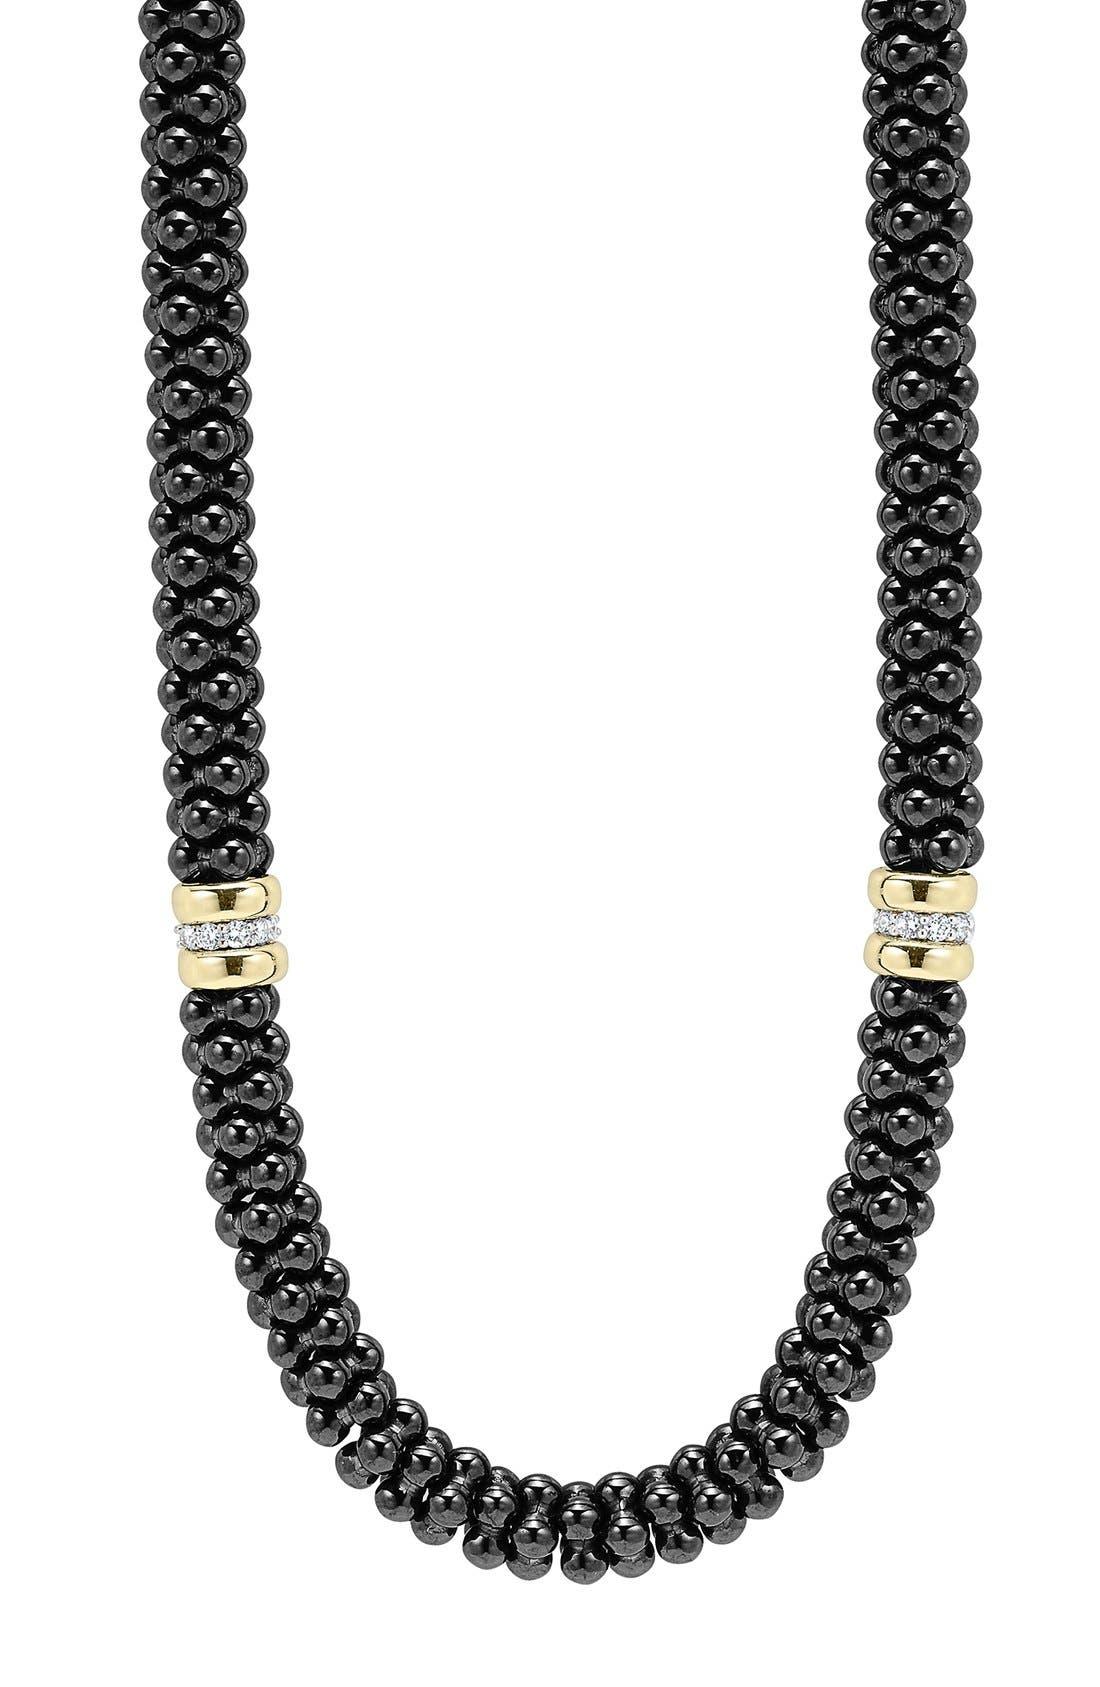 'Black Caviar' 7mm Beaded Diamond Station Necklace,                             Alternate thumbnail 3, color,                             BLACK CAVIAR/ GOLD